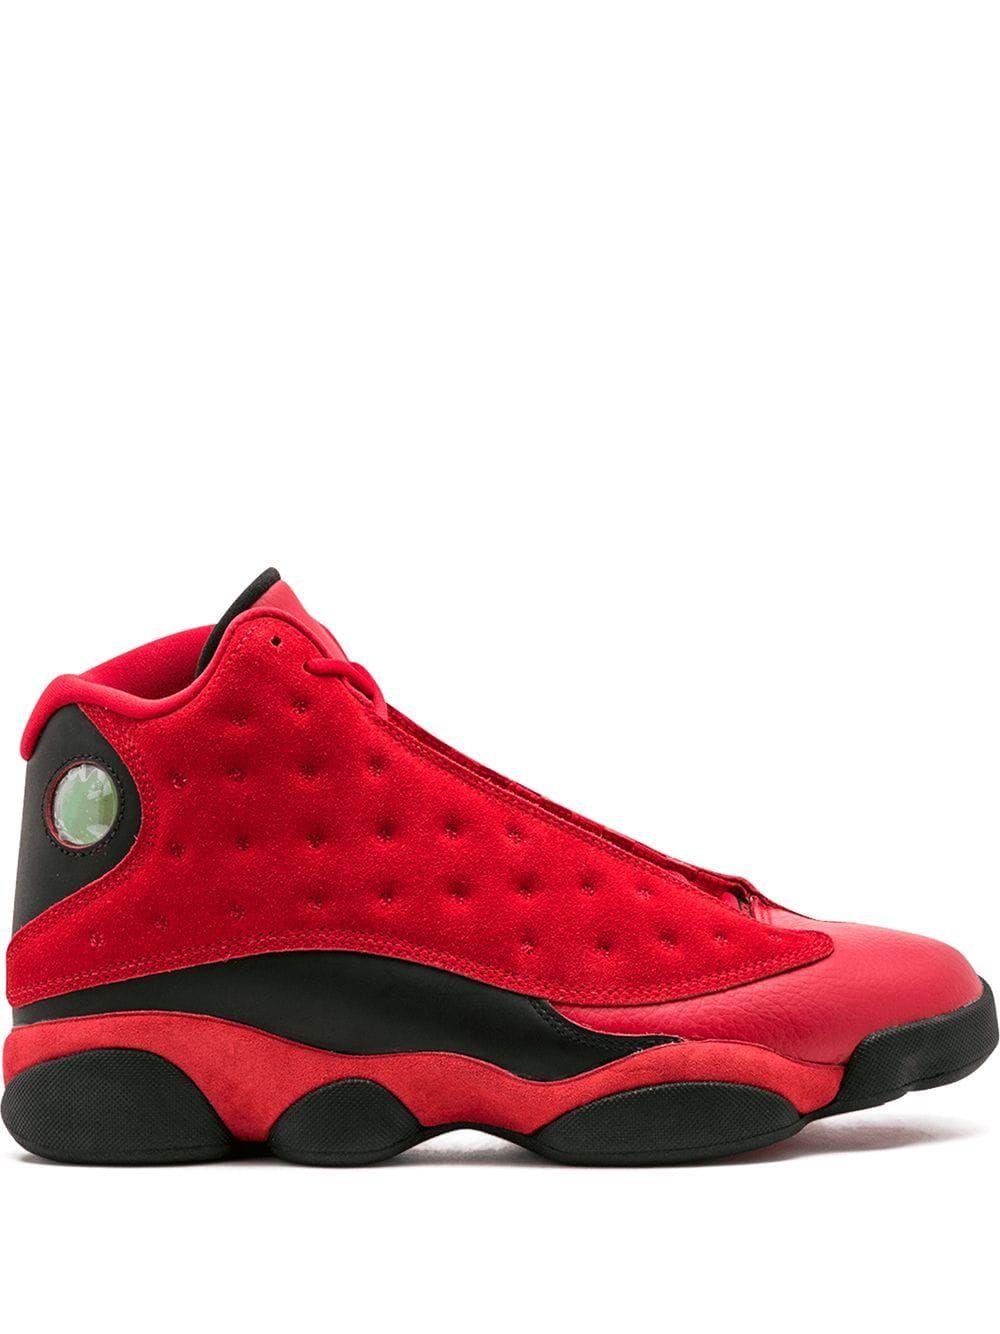 Air Jordan 13 Retro (GS) Big Kids (white metallic silver university red)